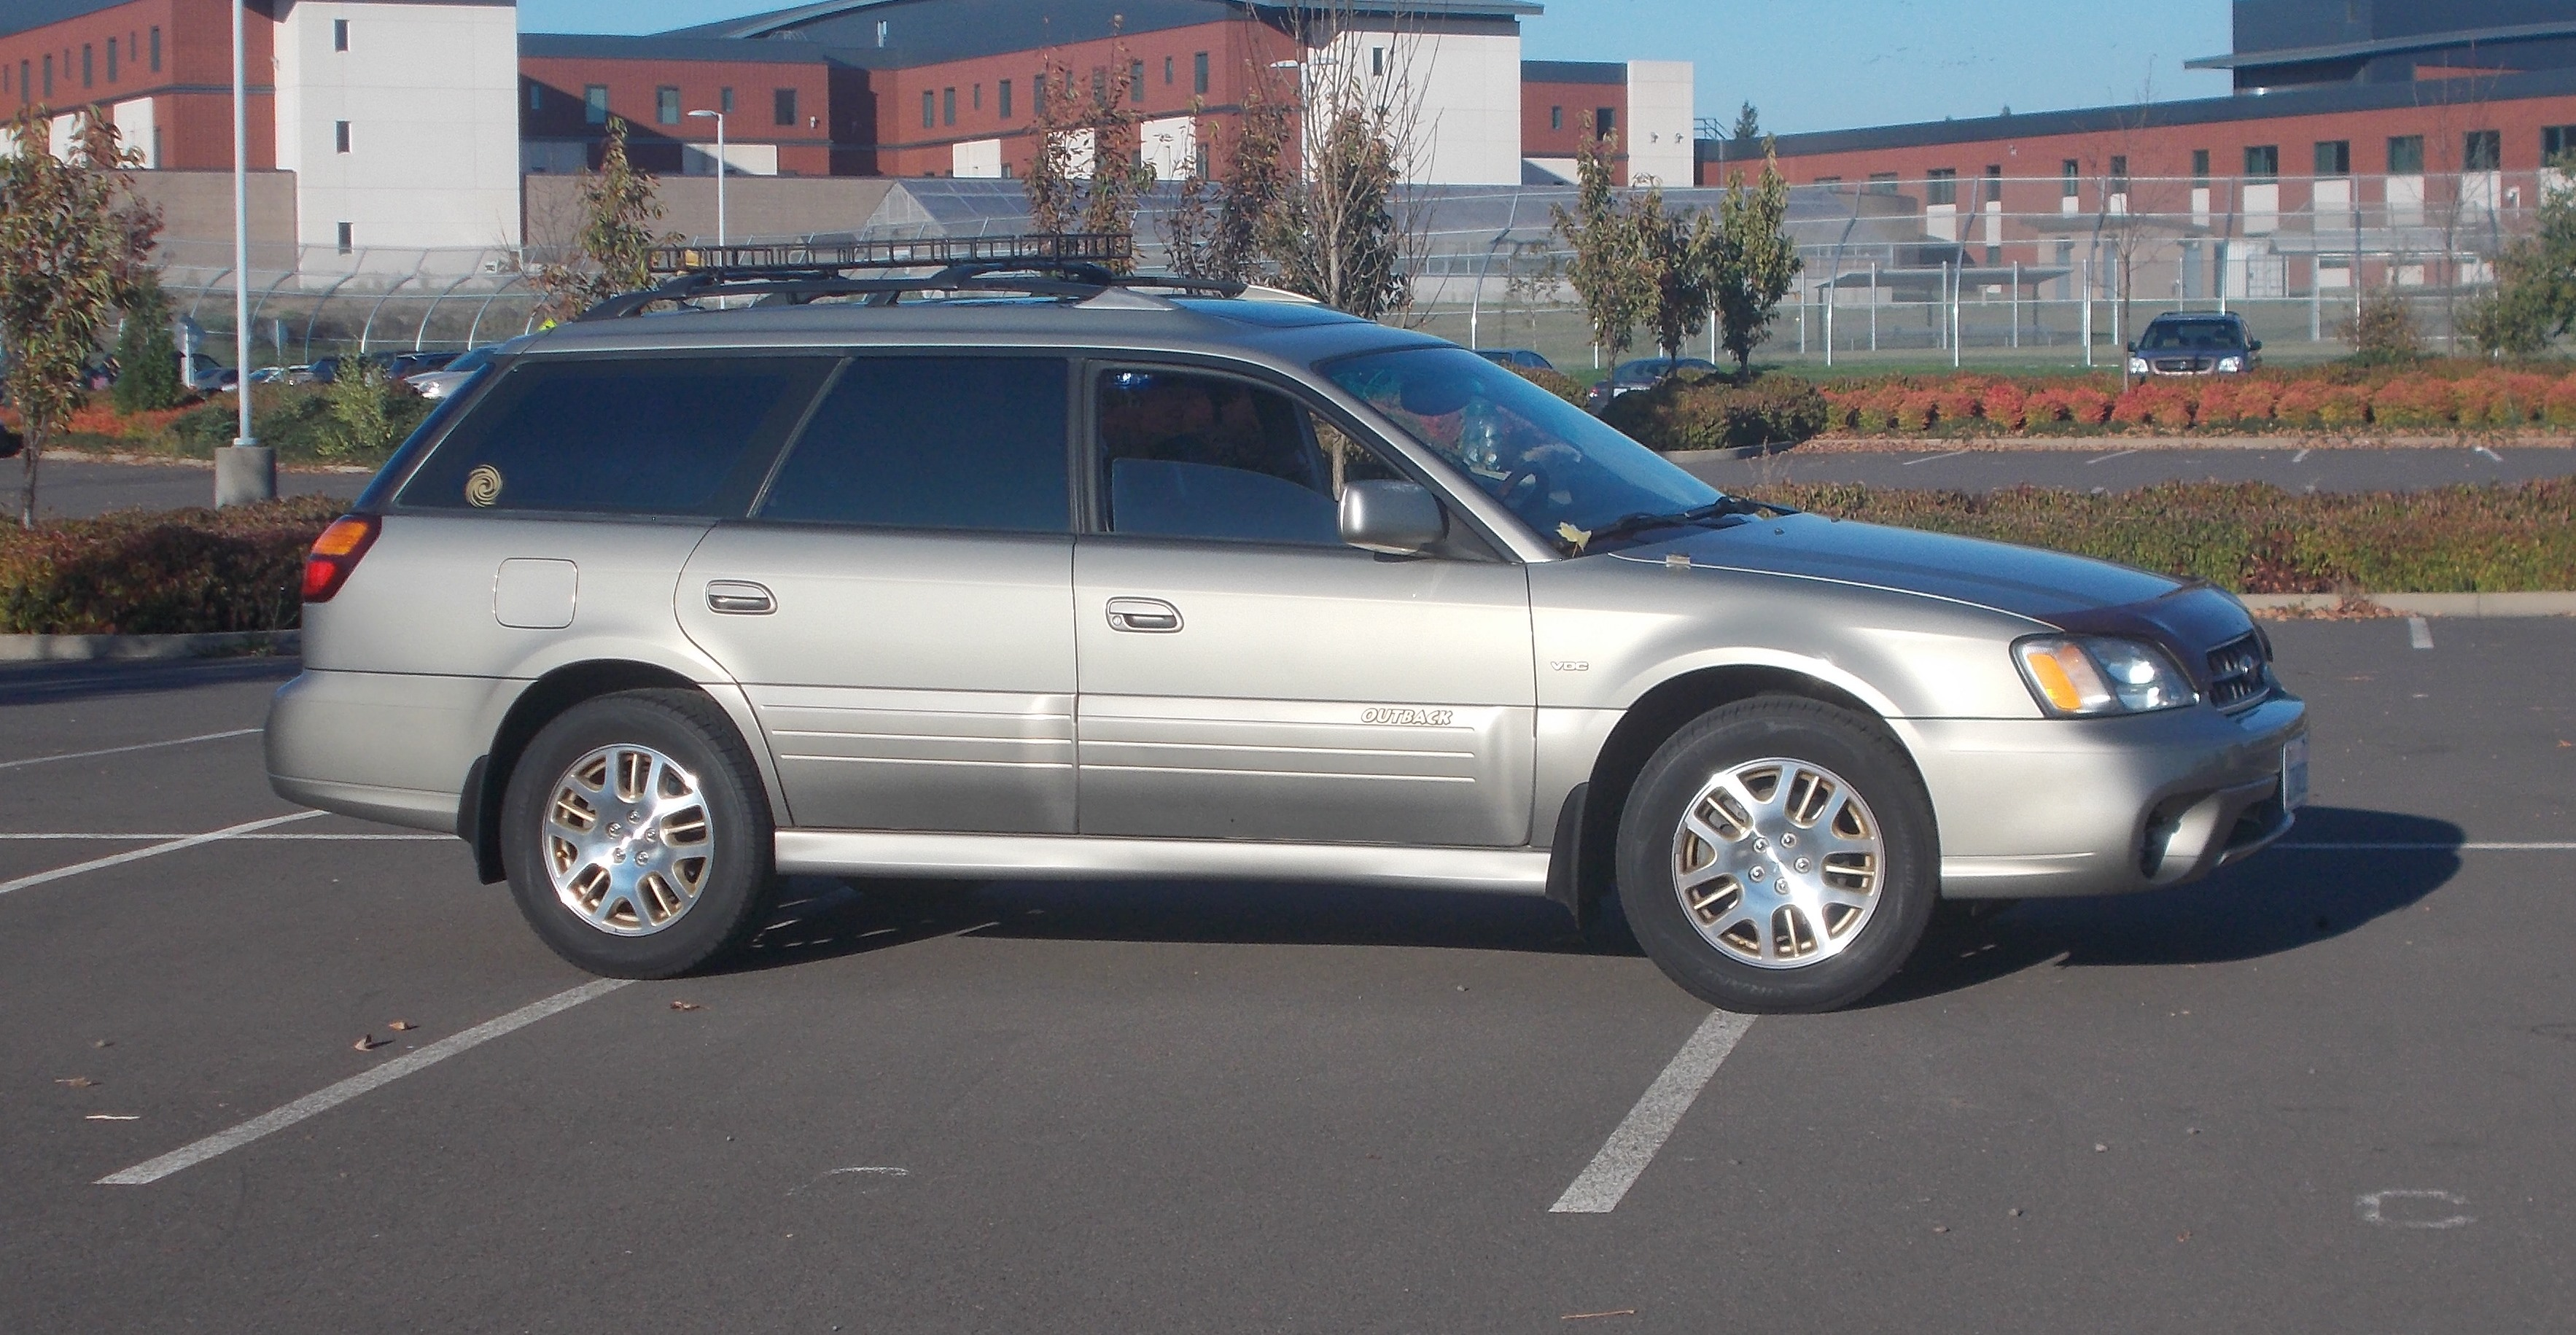 New to me 03 VDC Subaru Outback Subaru Outback Forums